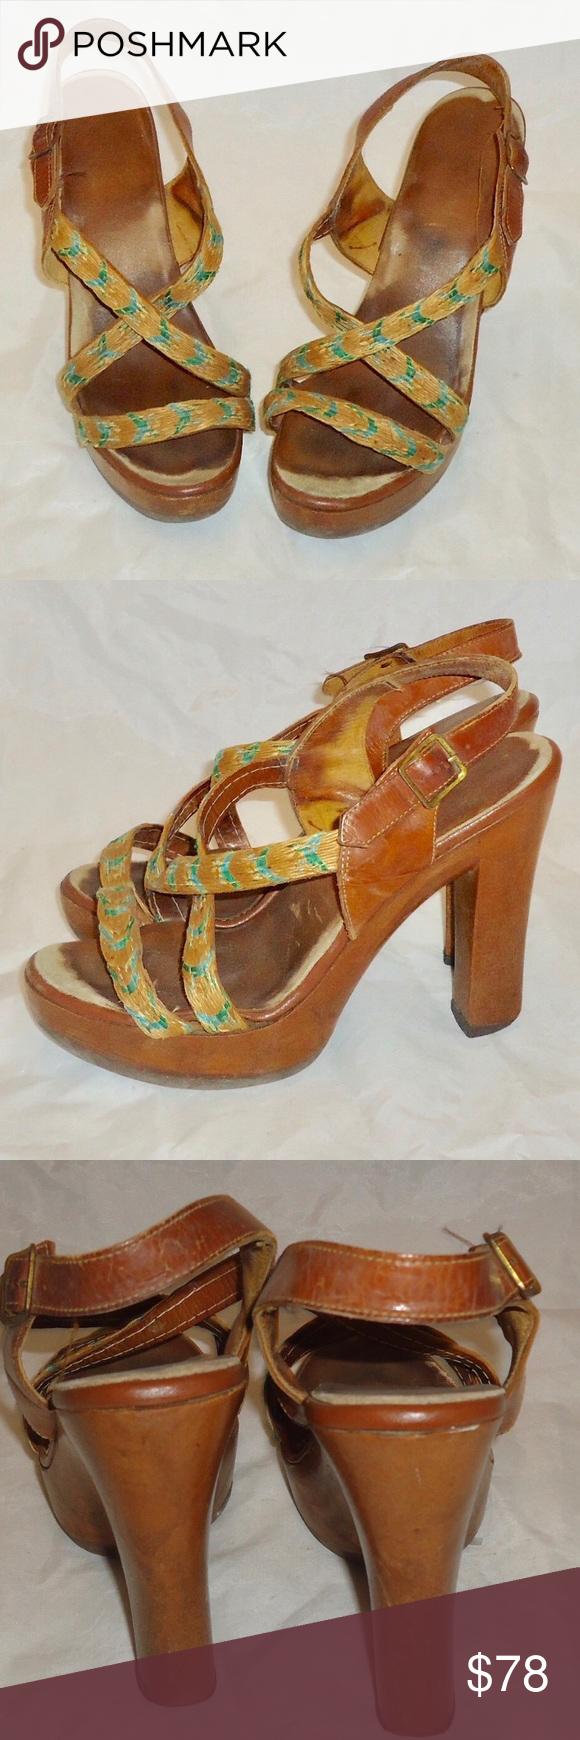 70s Clogs Platforms Sandals Wood Heels Shoes 7.5 Vintage